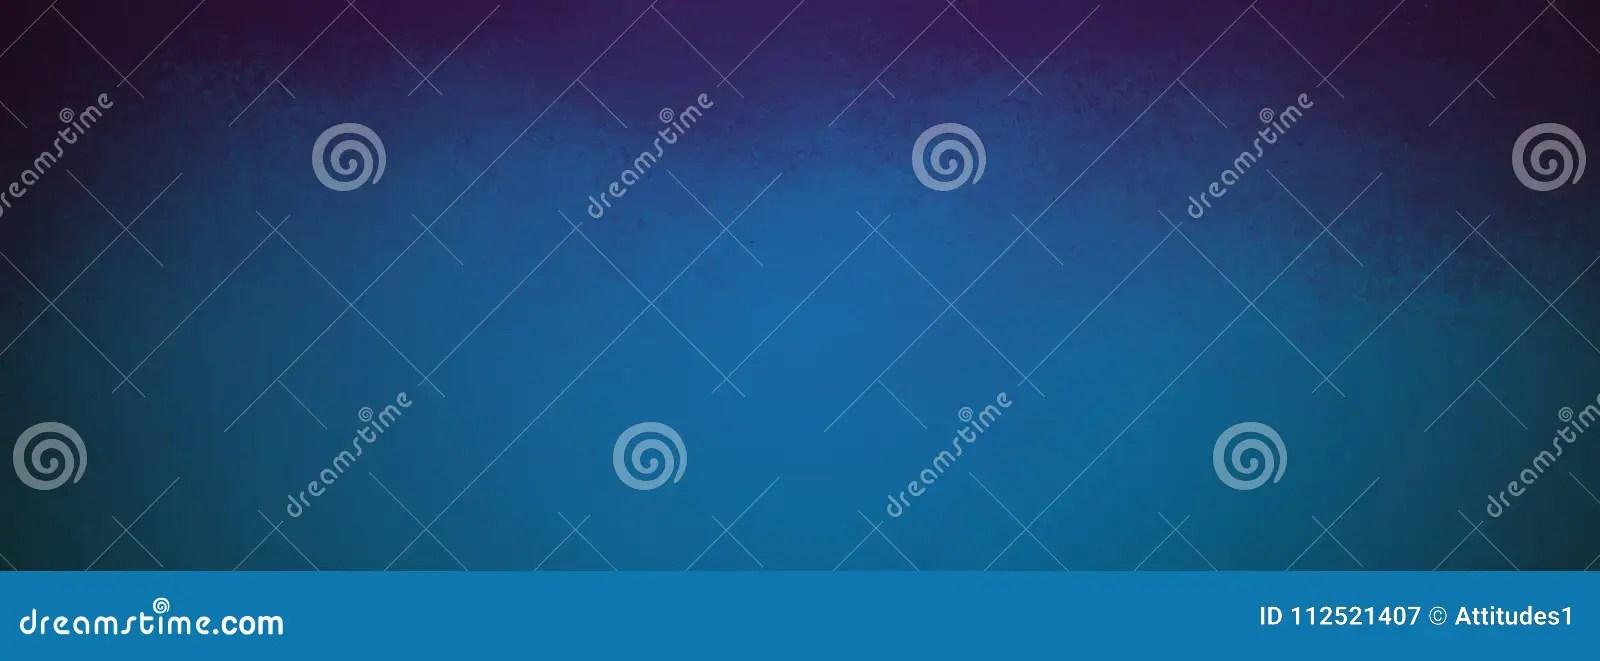 Elegant Blue Background With Black Textured Corners And Vintage